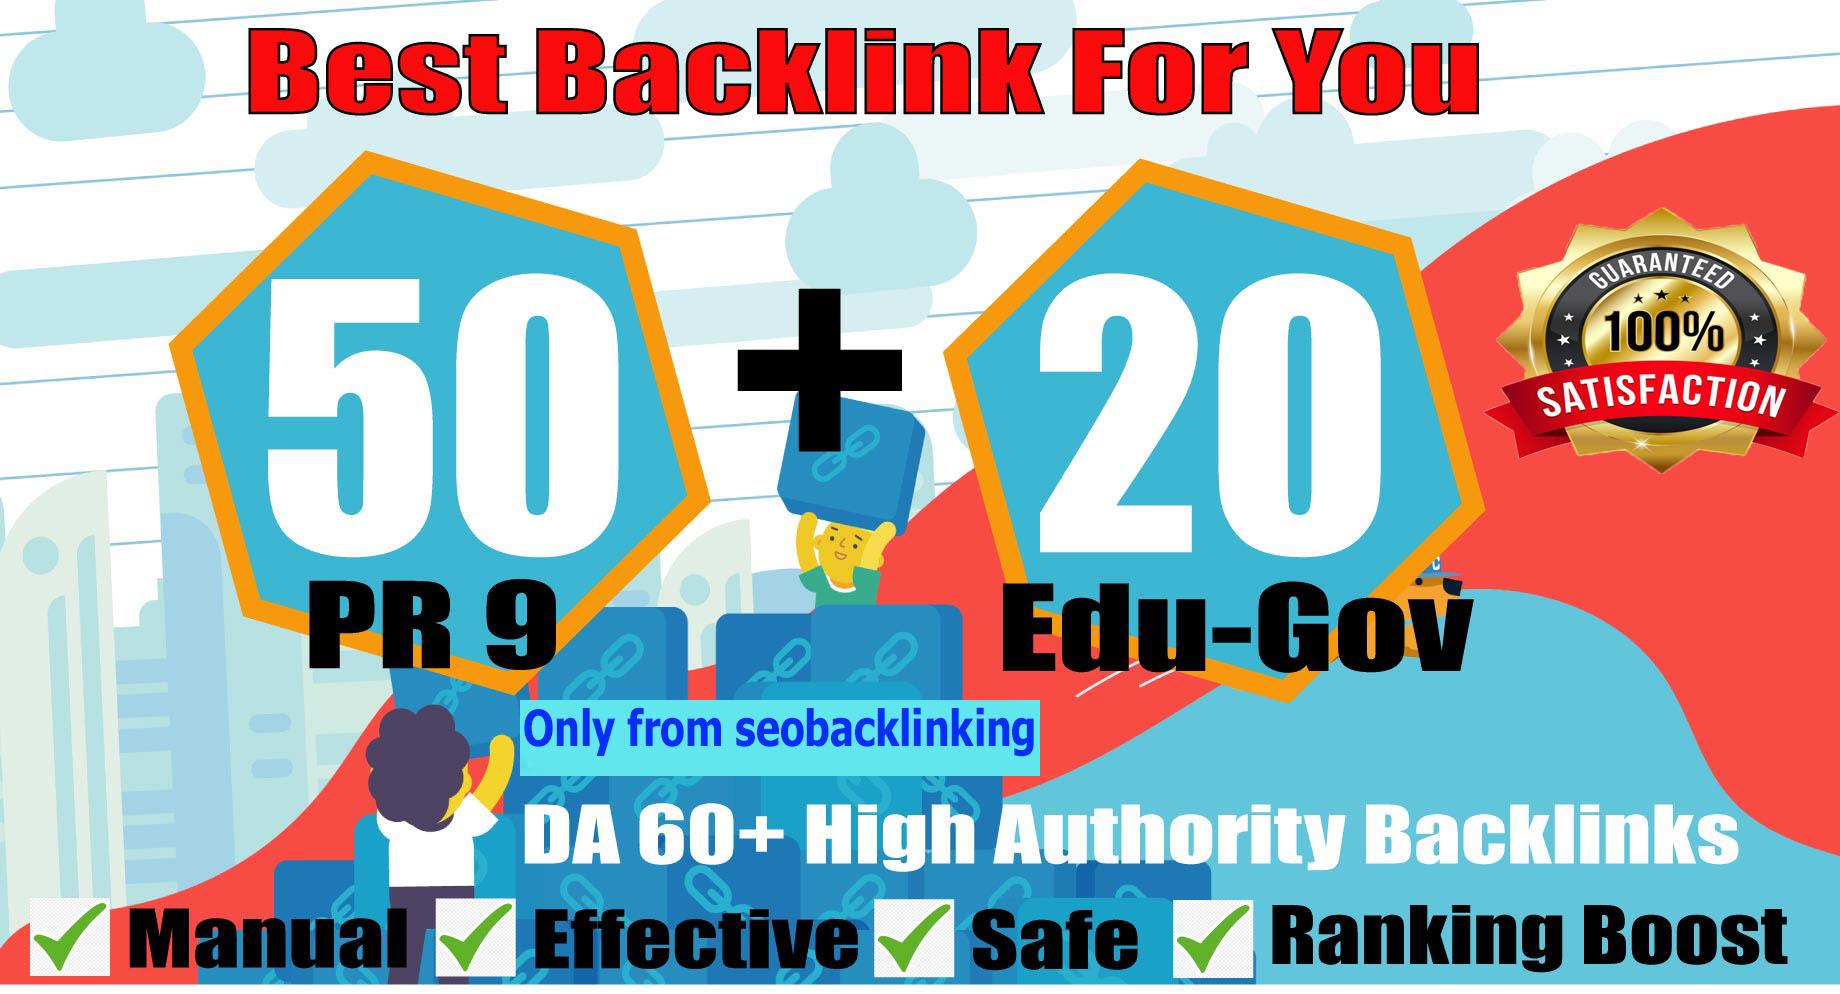 Super Quality Do 50 PR9+20 EDU-GOV Powerful Seo Backlink Permanent Links Increase Google Ranking